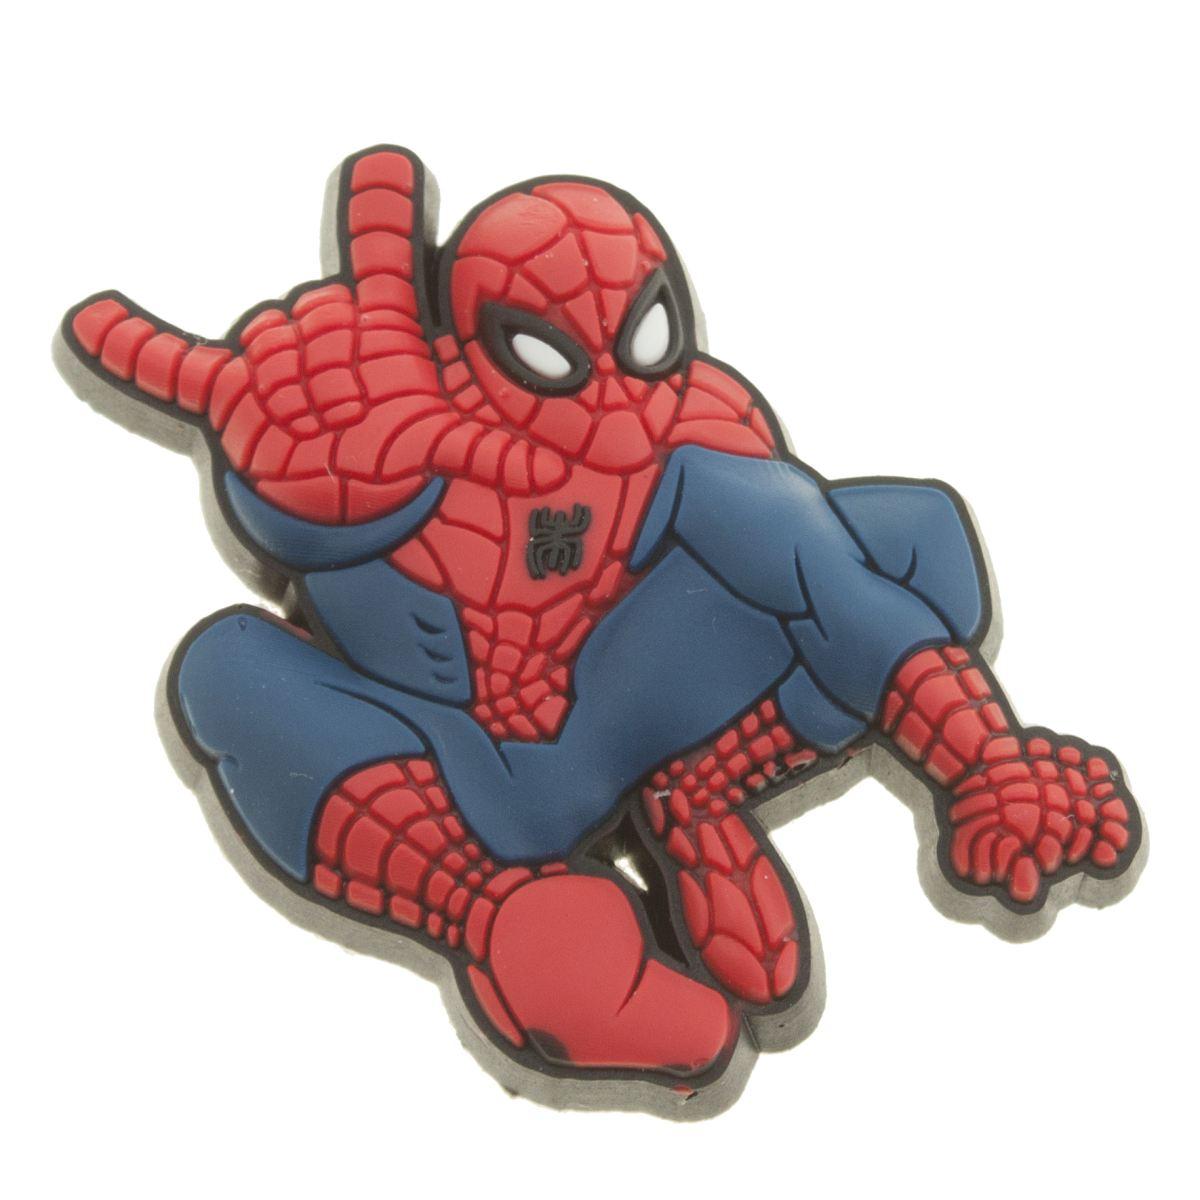 jibbitz Jibbitz Red Leaping Spiderman Shoe Accessories